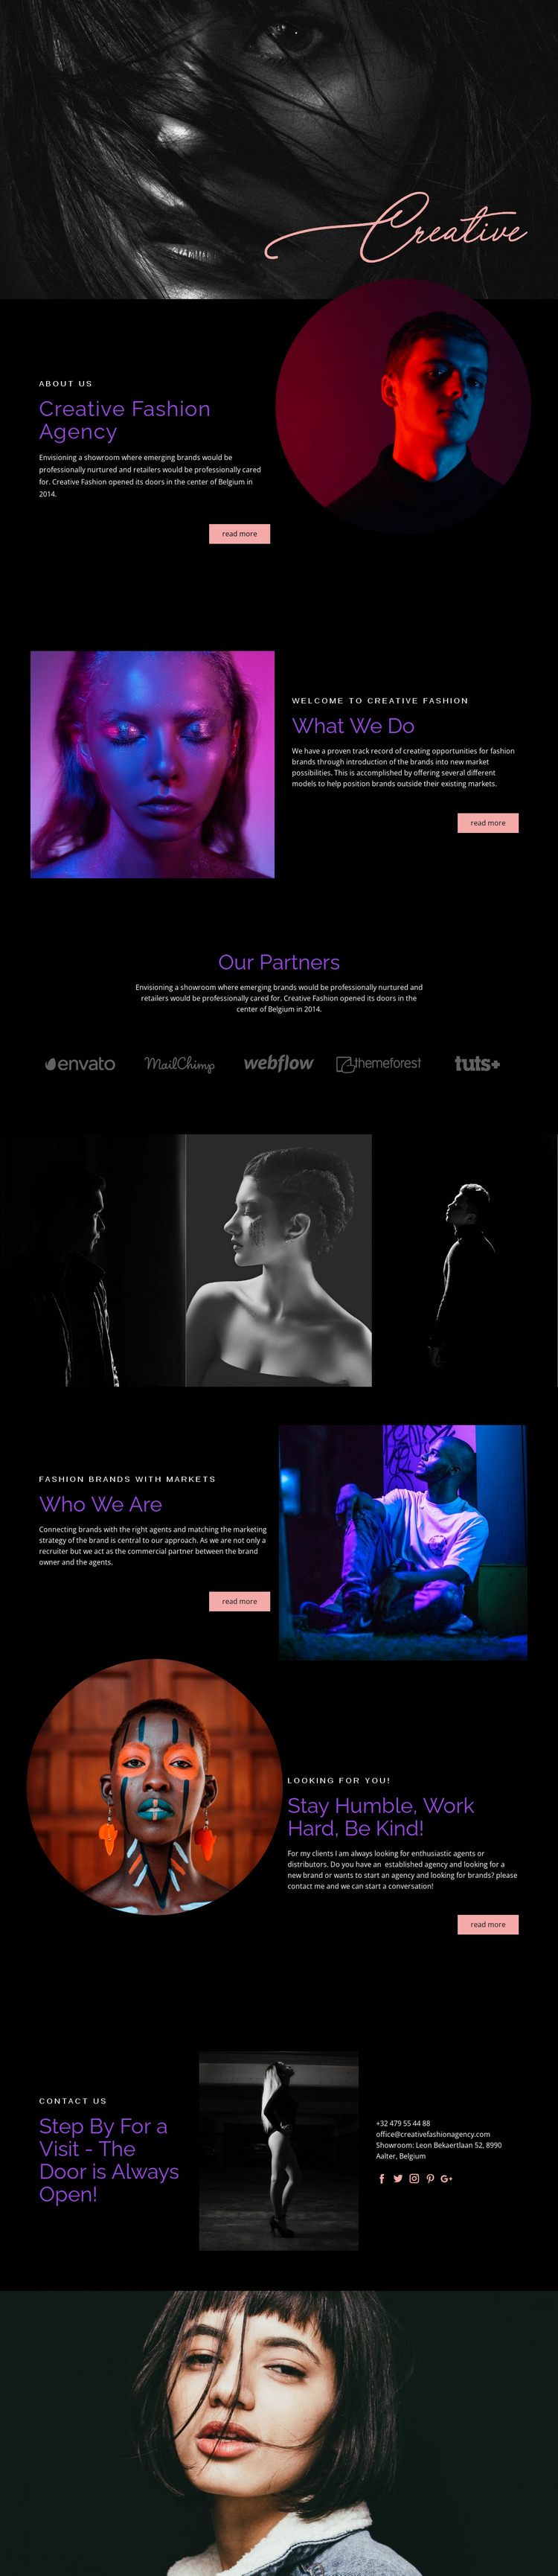 Creative Fashion Agency Website Mockup